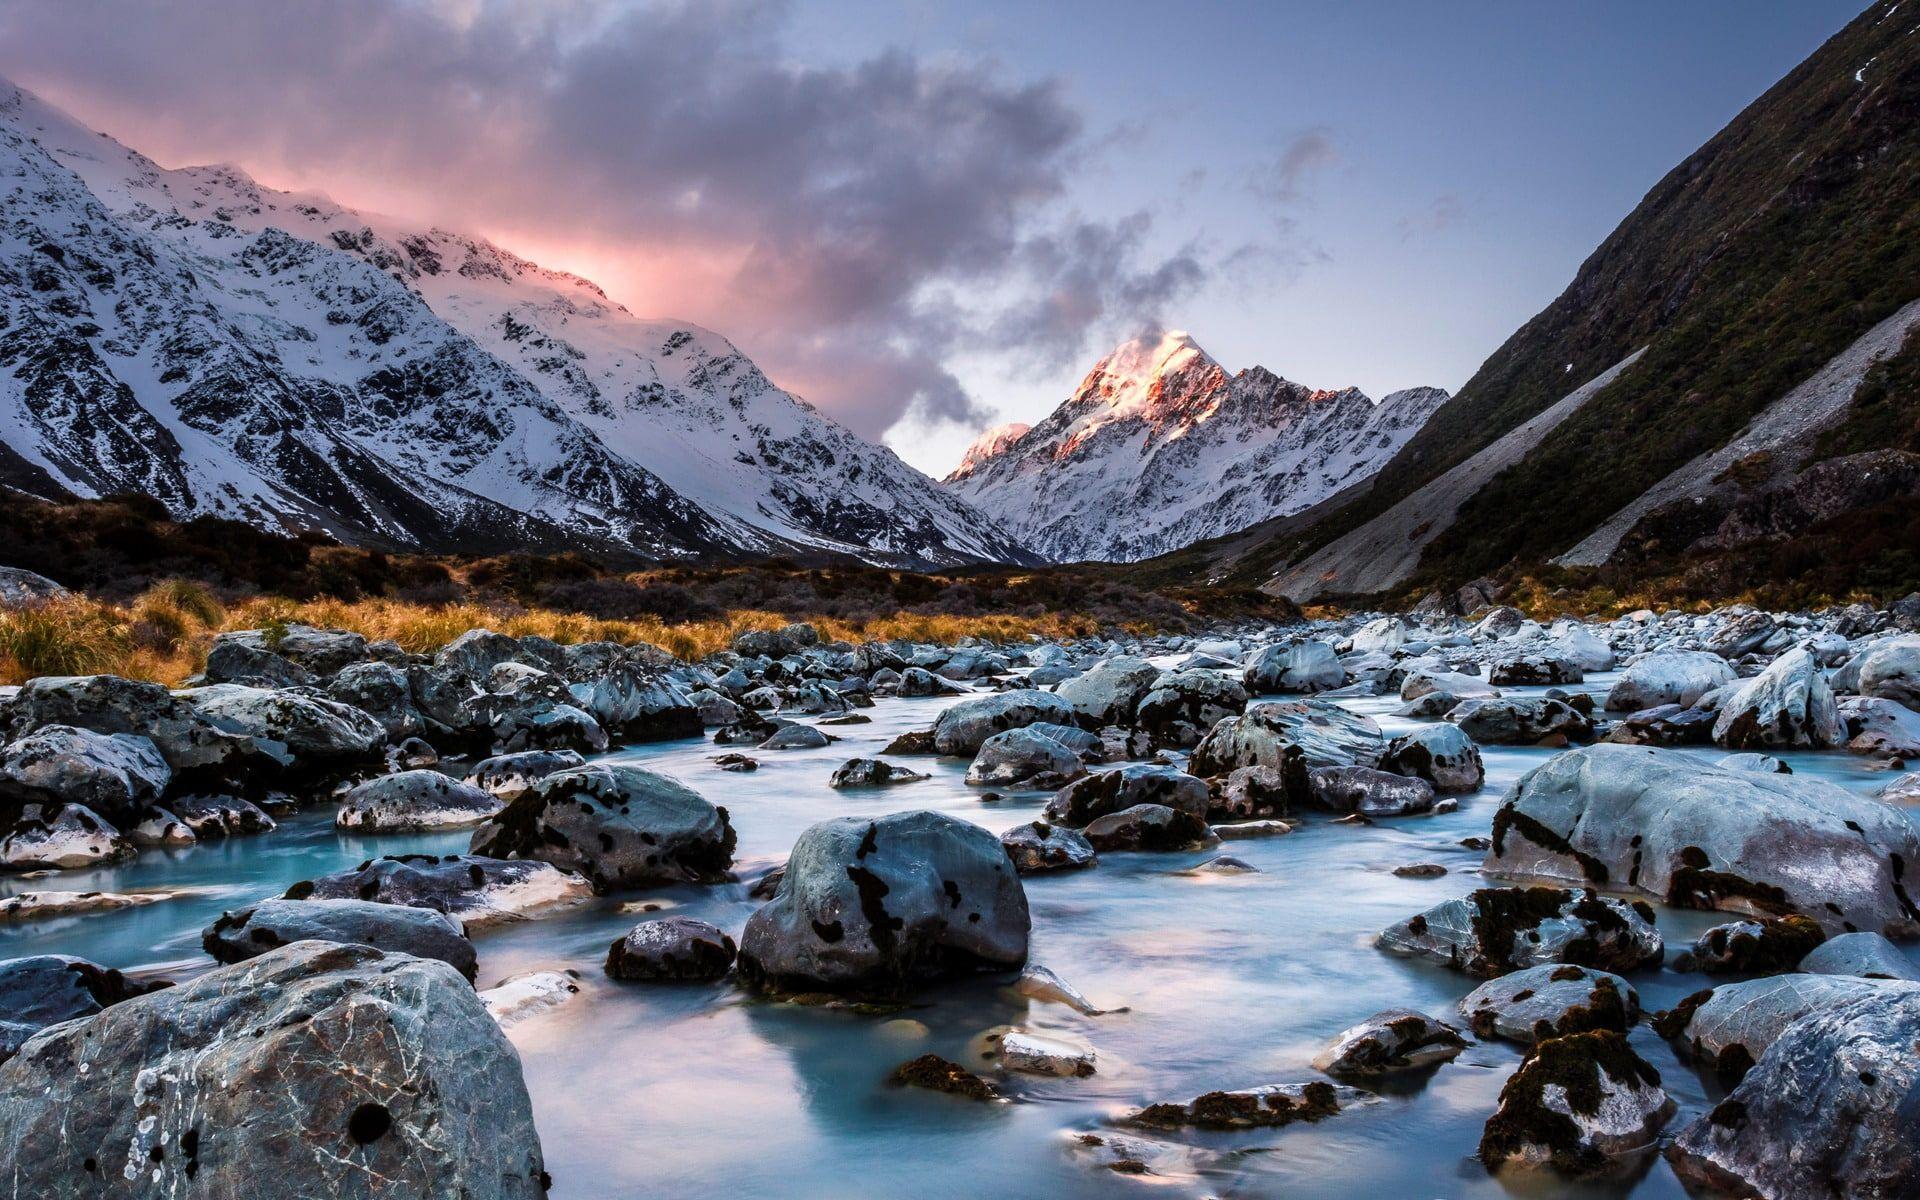 New Zealand South Island Travel Scenery Wallpaper 1080p Wallpaper Hdwallpaper Desktop Island Travel New Zealand South Island South Island